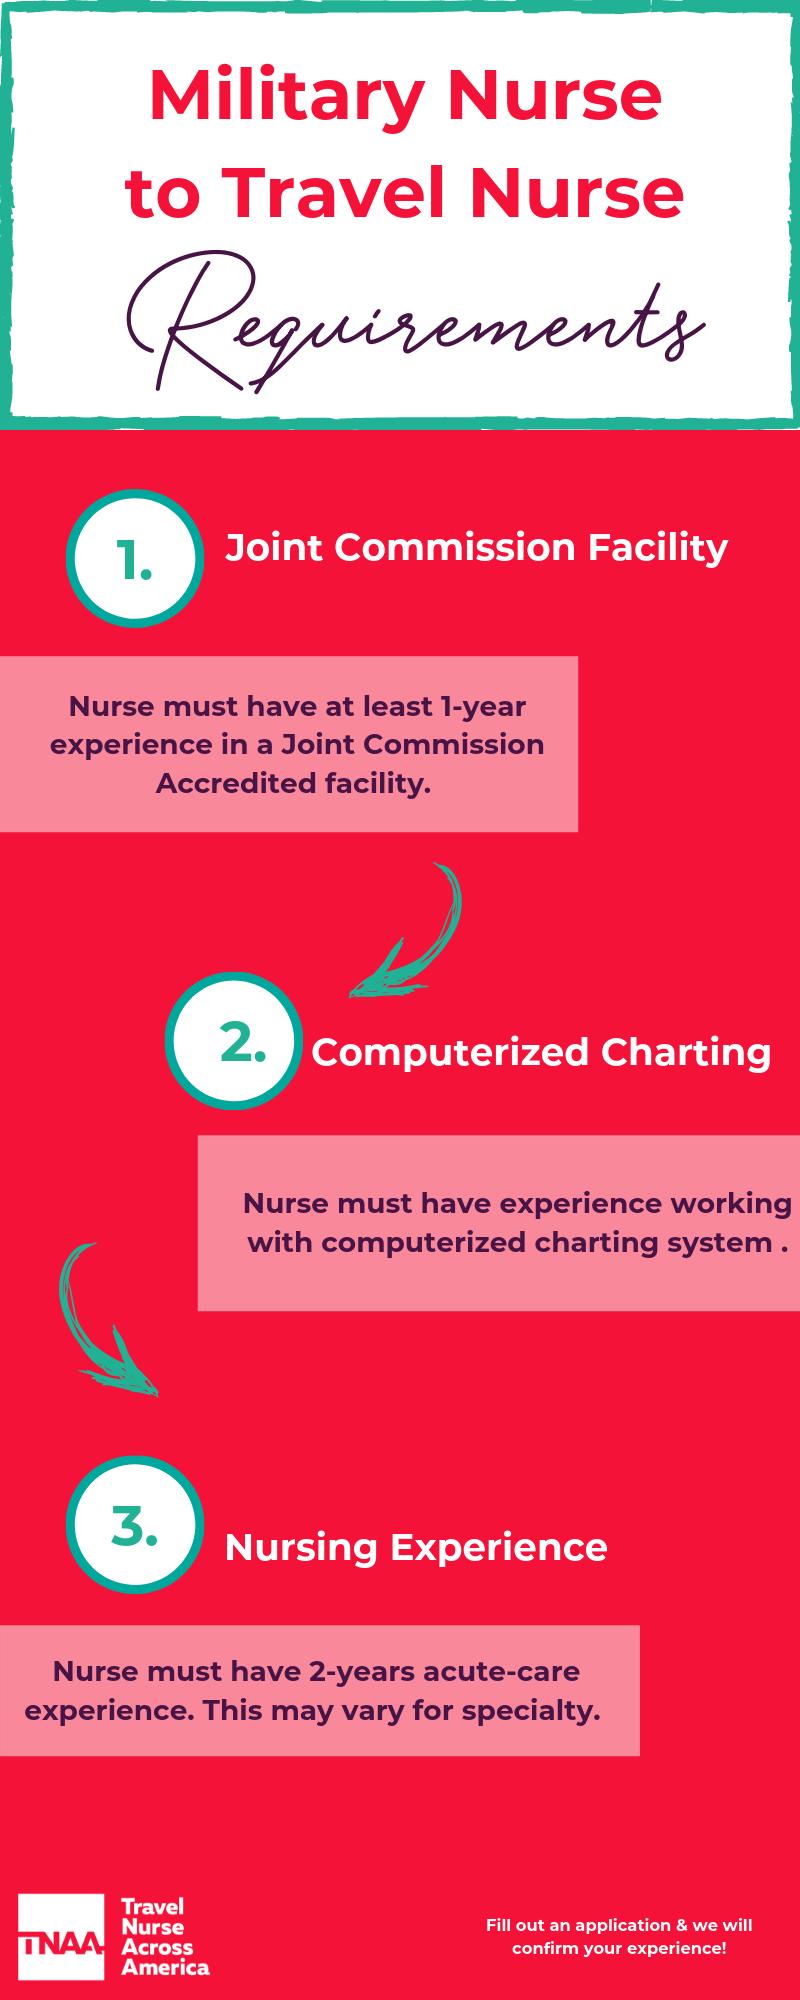 TNAA military nurse requirements